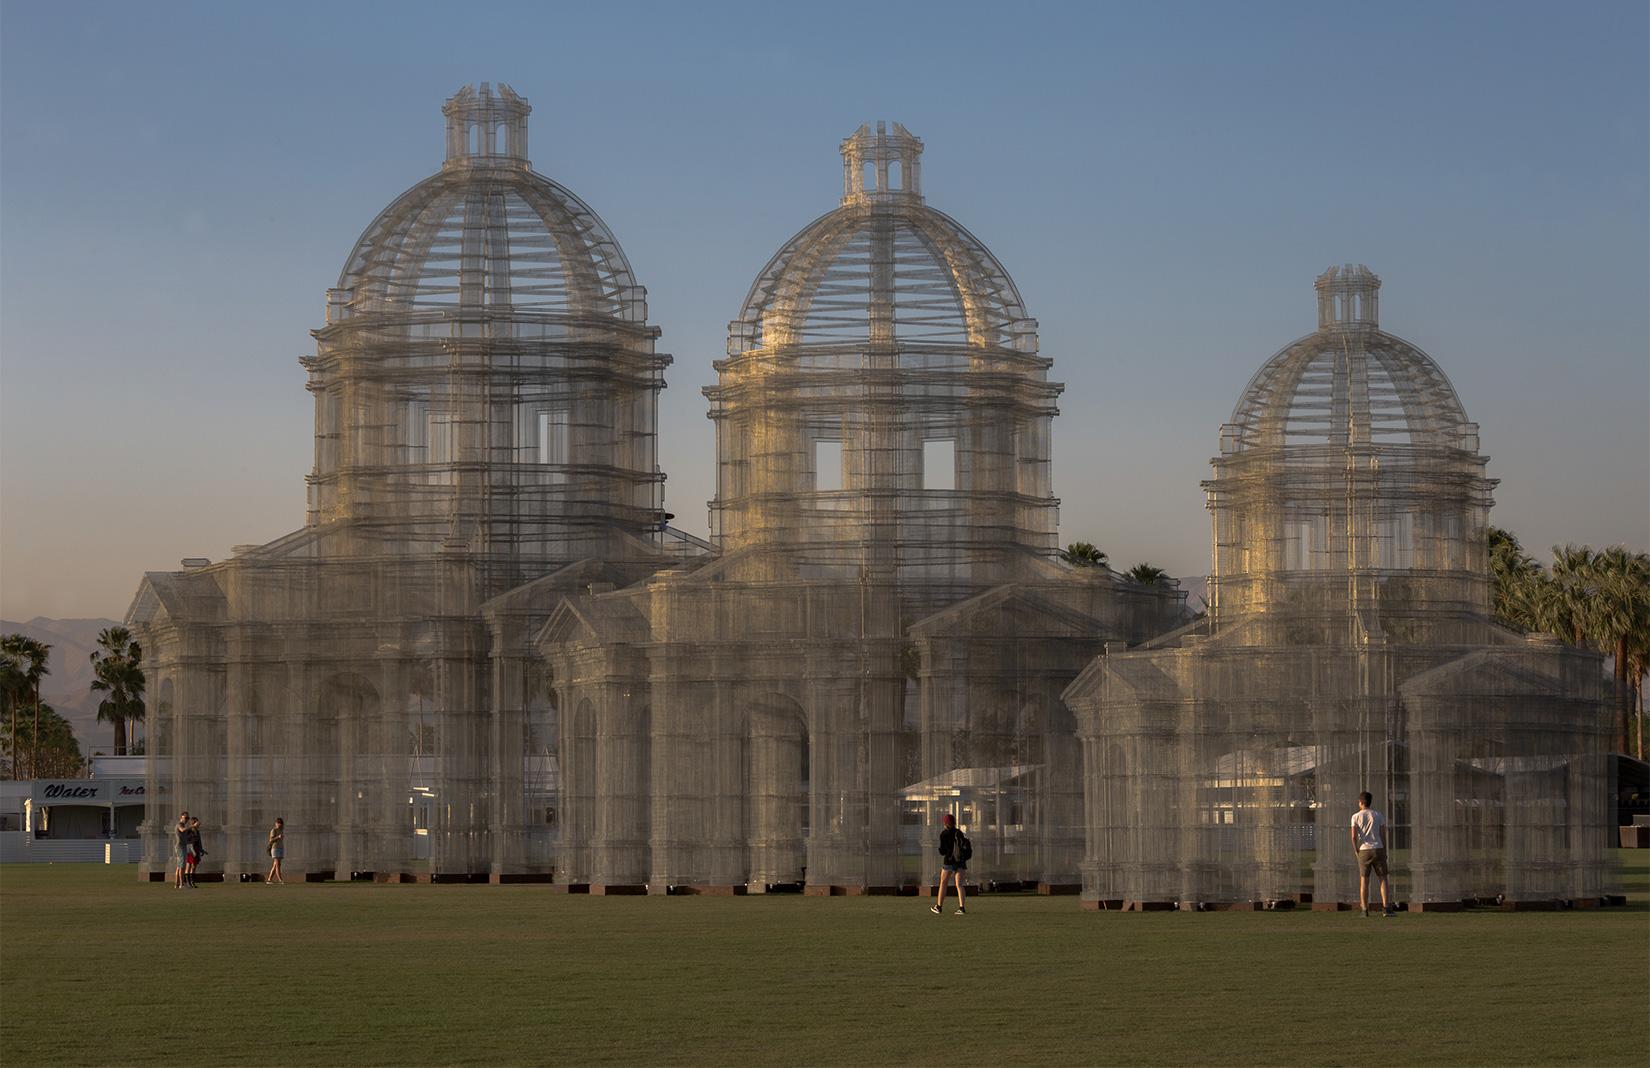 Edoardo Tresoldi, Etherea installation at Coachella